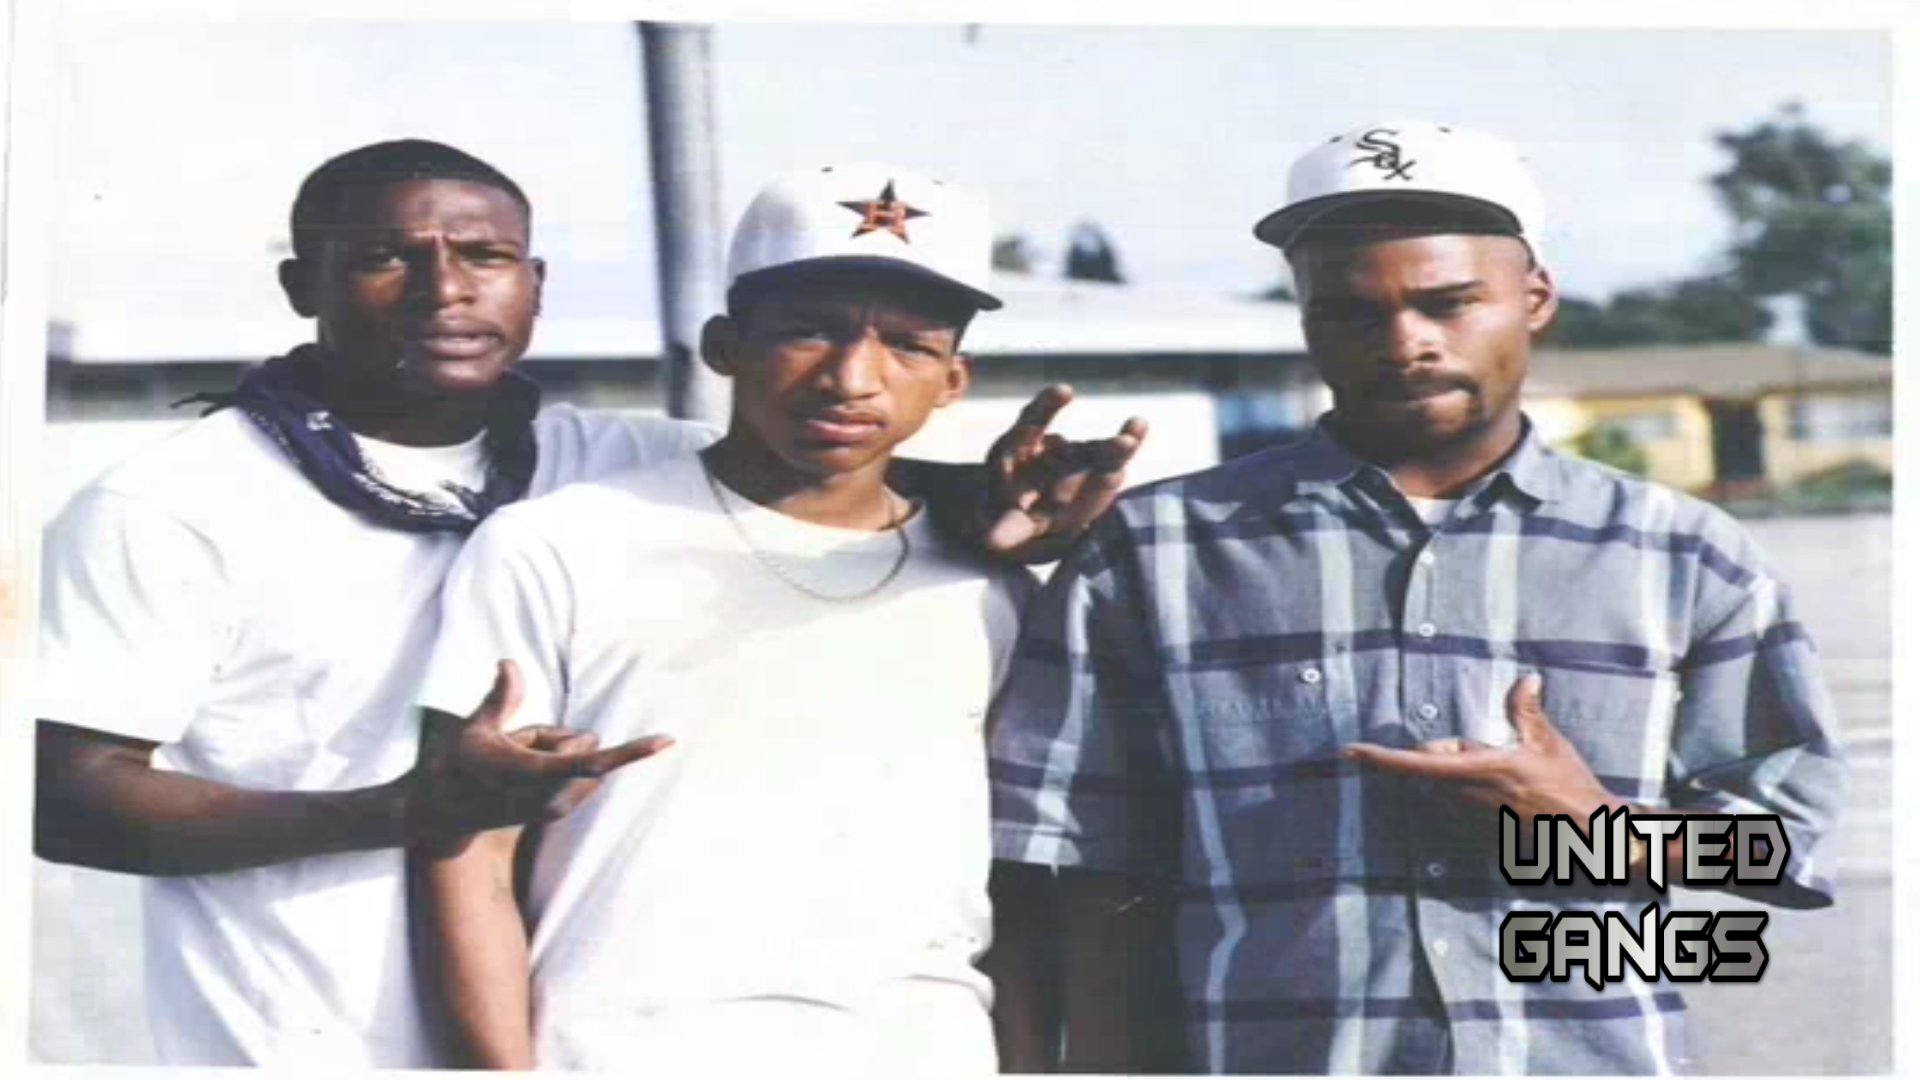 Poccet Hood Compton Crips